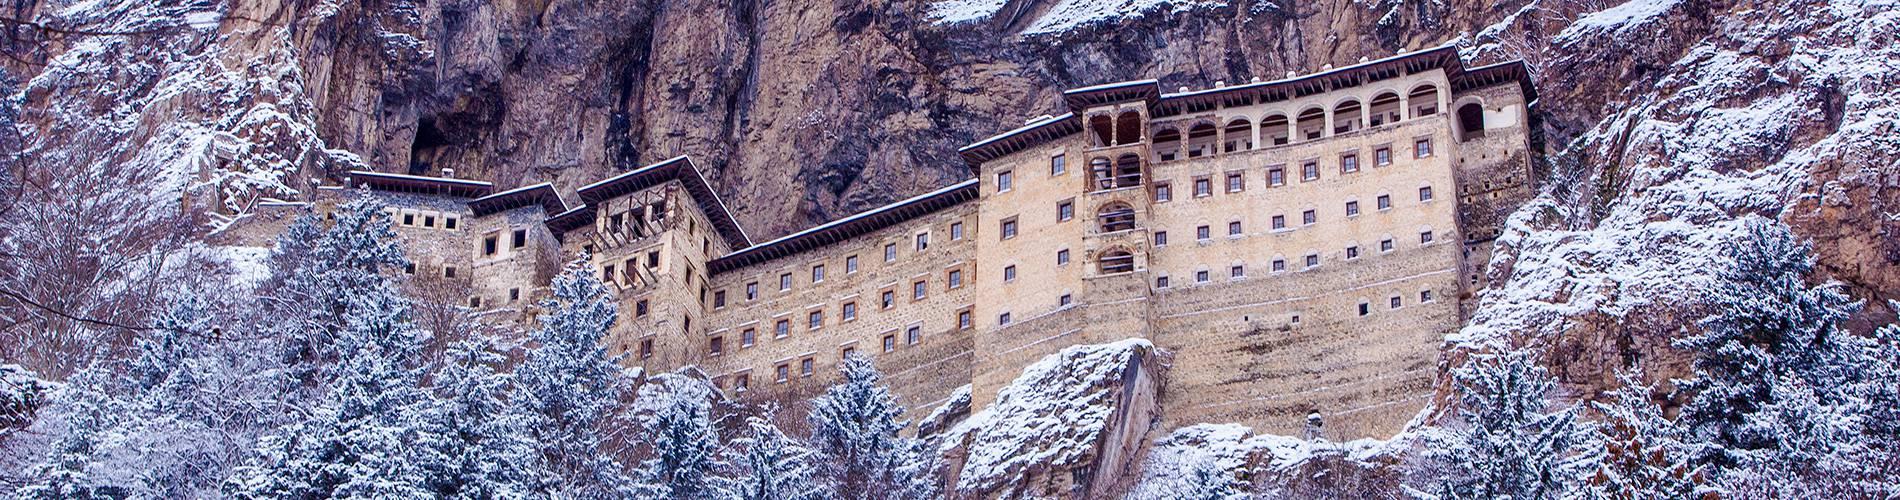 Sumela Monastery Турция, фото